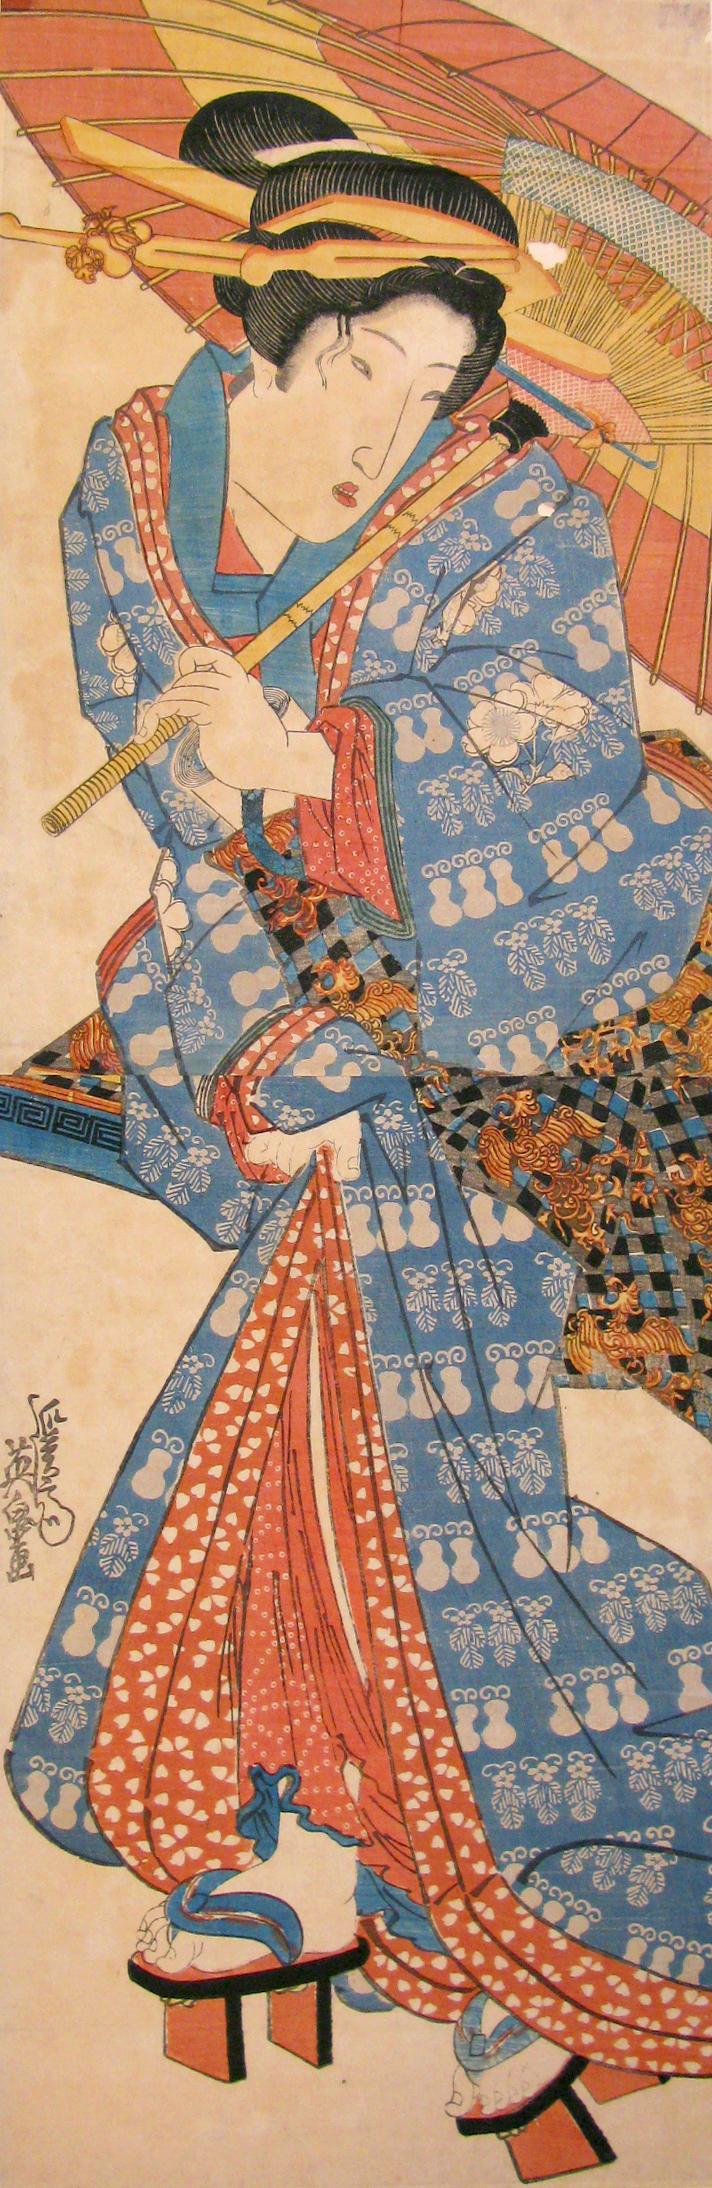 Eisen, <i>Untitled woman</i>, Japanese Ukiyo-e print, n.d.